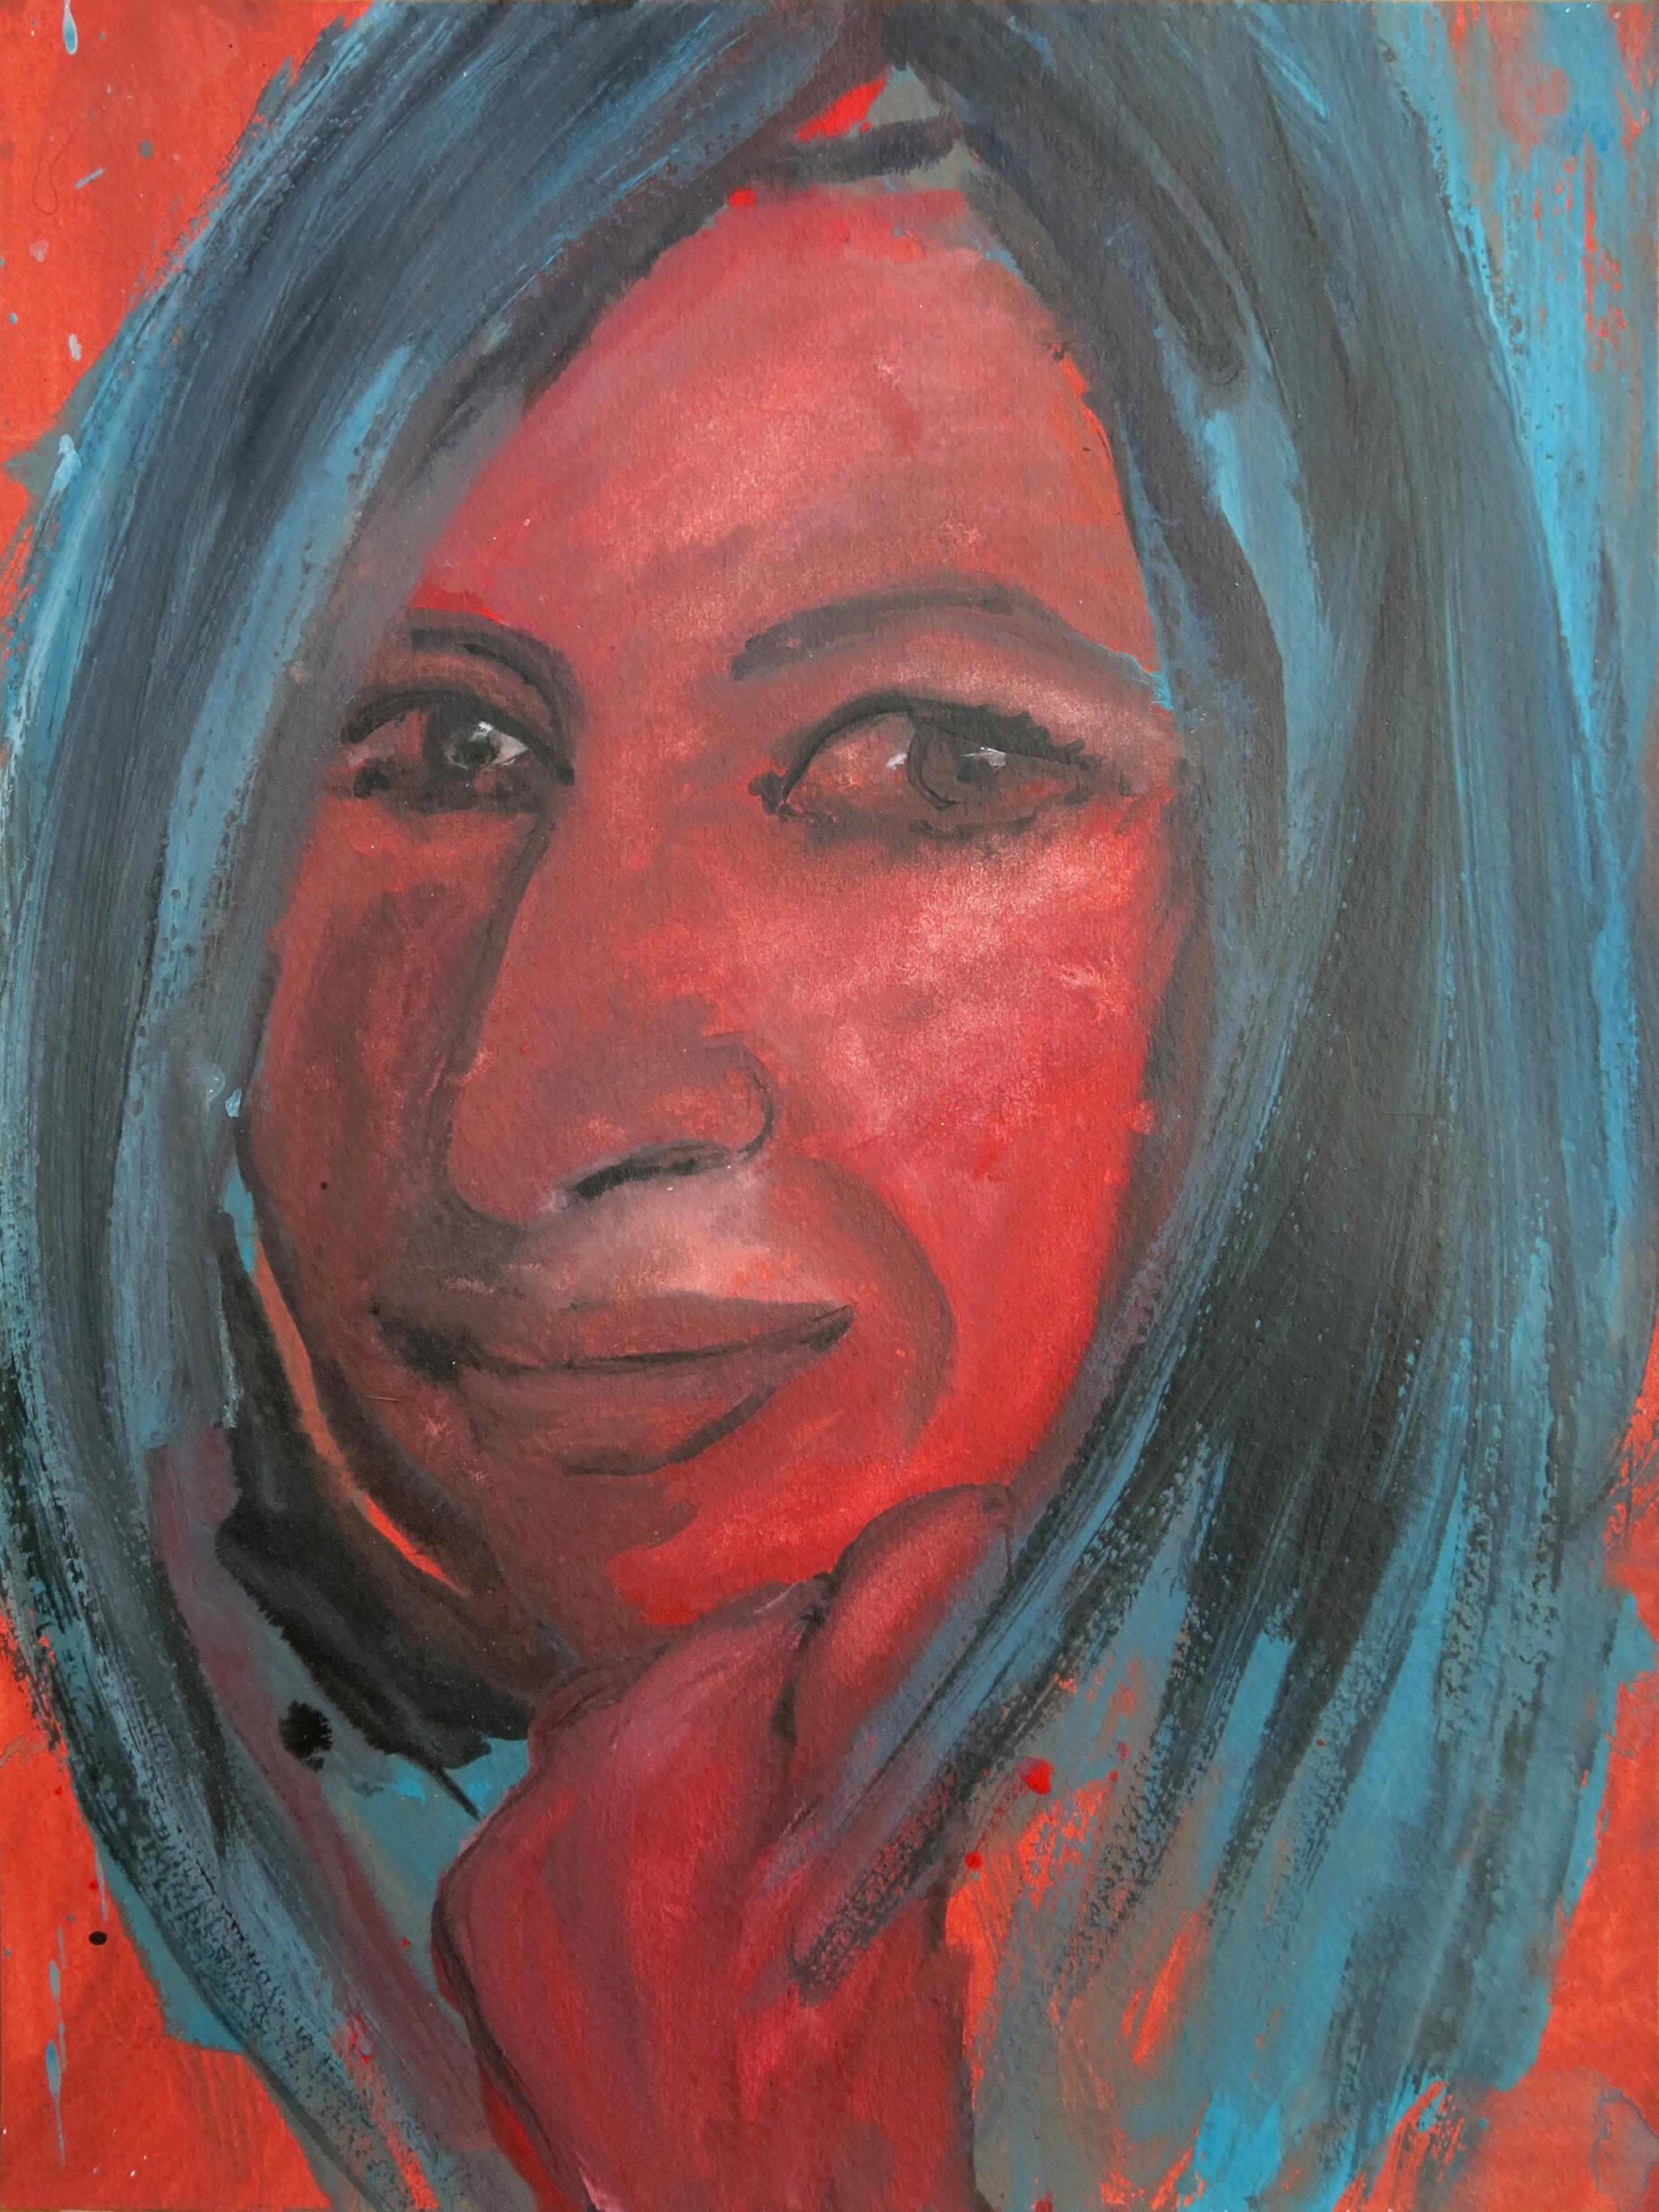 Barbra Streisand Portrait #105